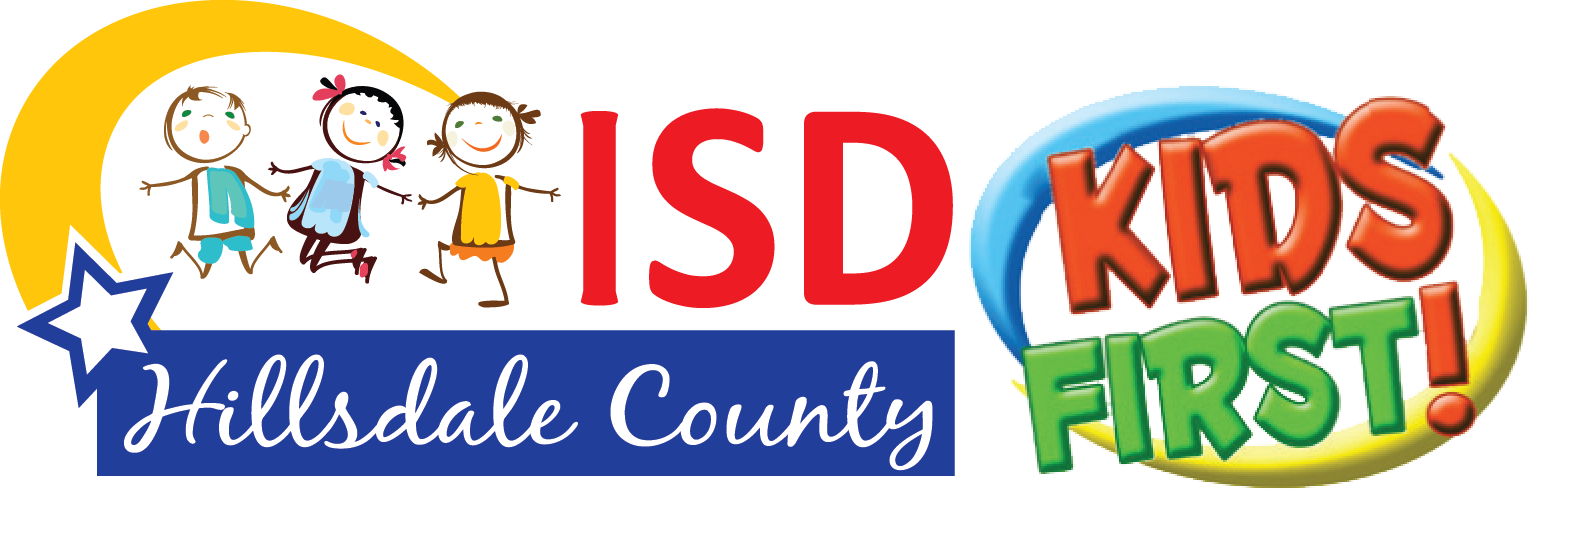 HCISD Logo 2016 Final_Kids First_white